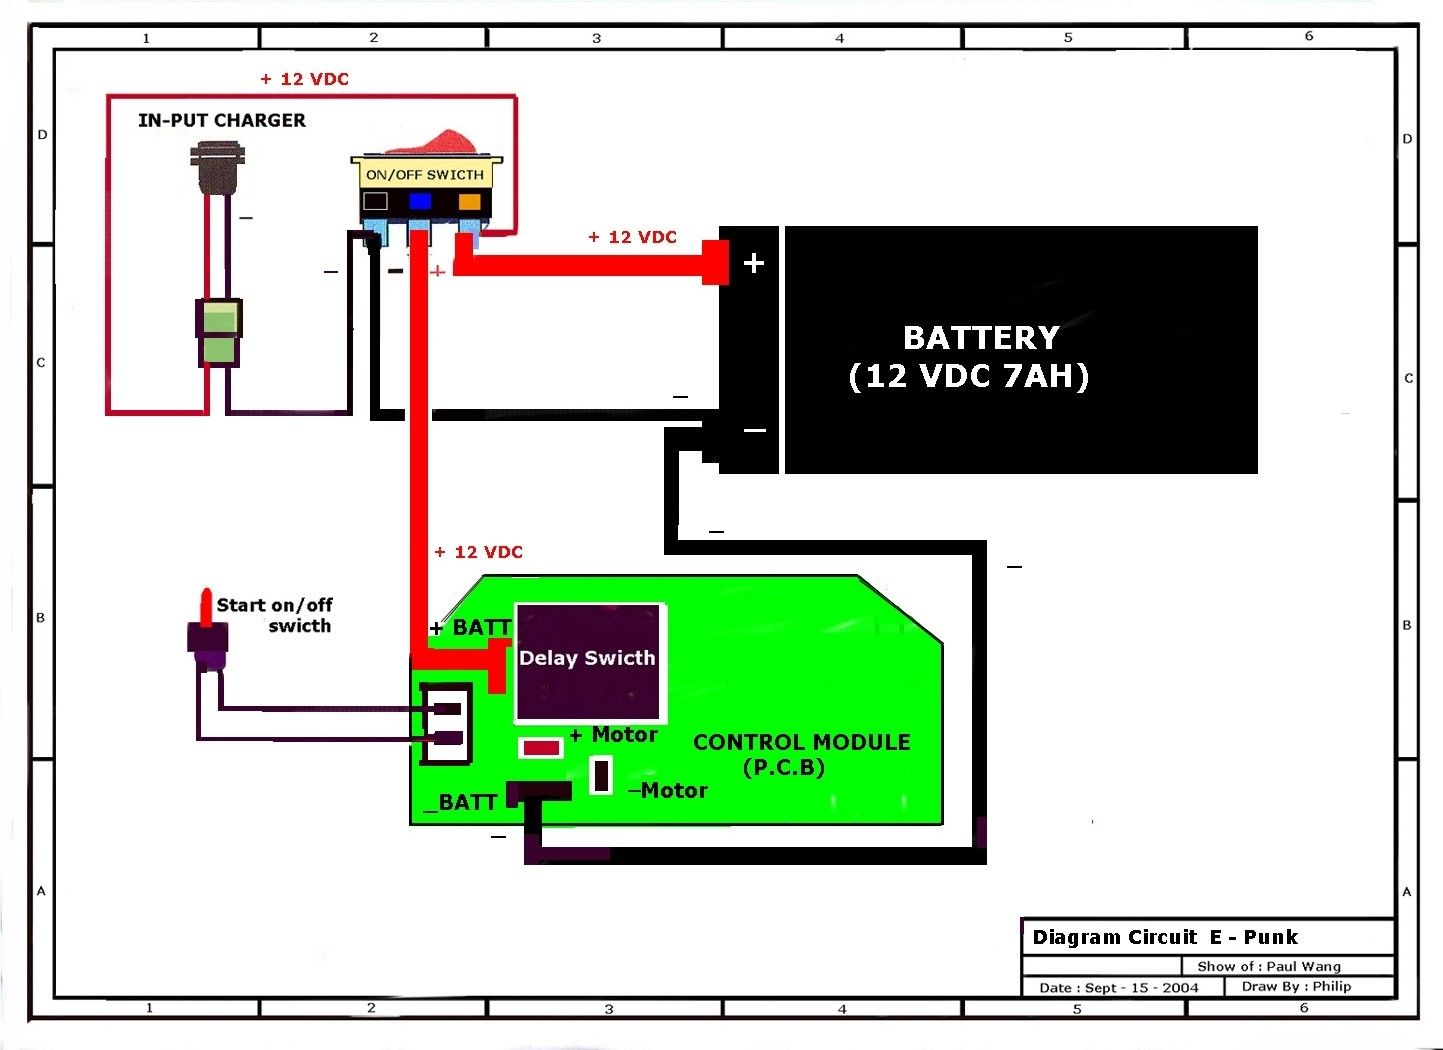 hight resolution of razor pocket bike wiring diagram wiring diagram expert x6 pocket bike wiring diagram wire diagram for